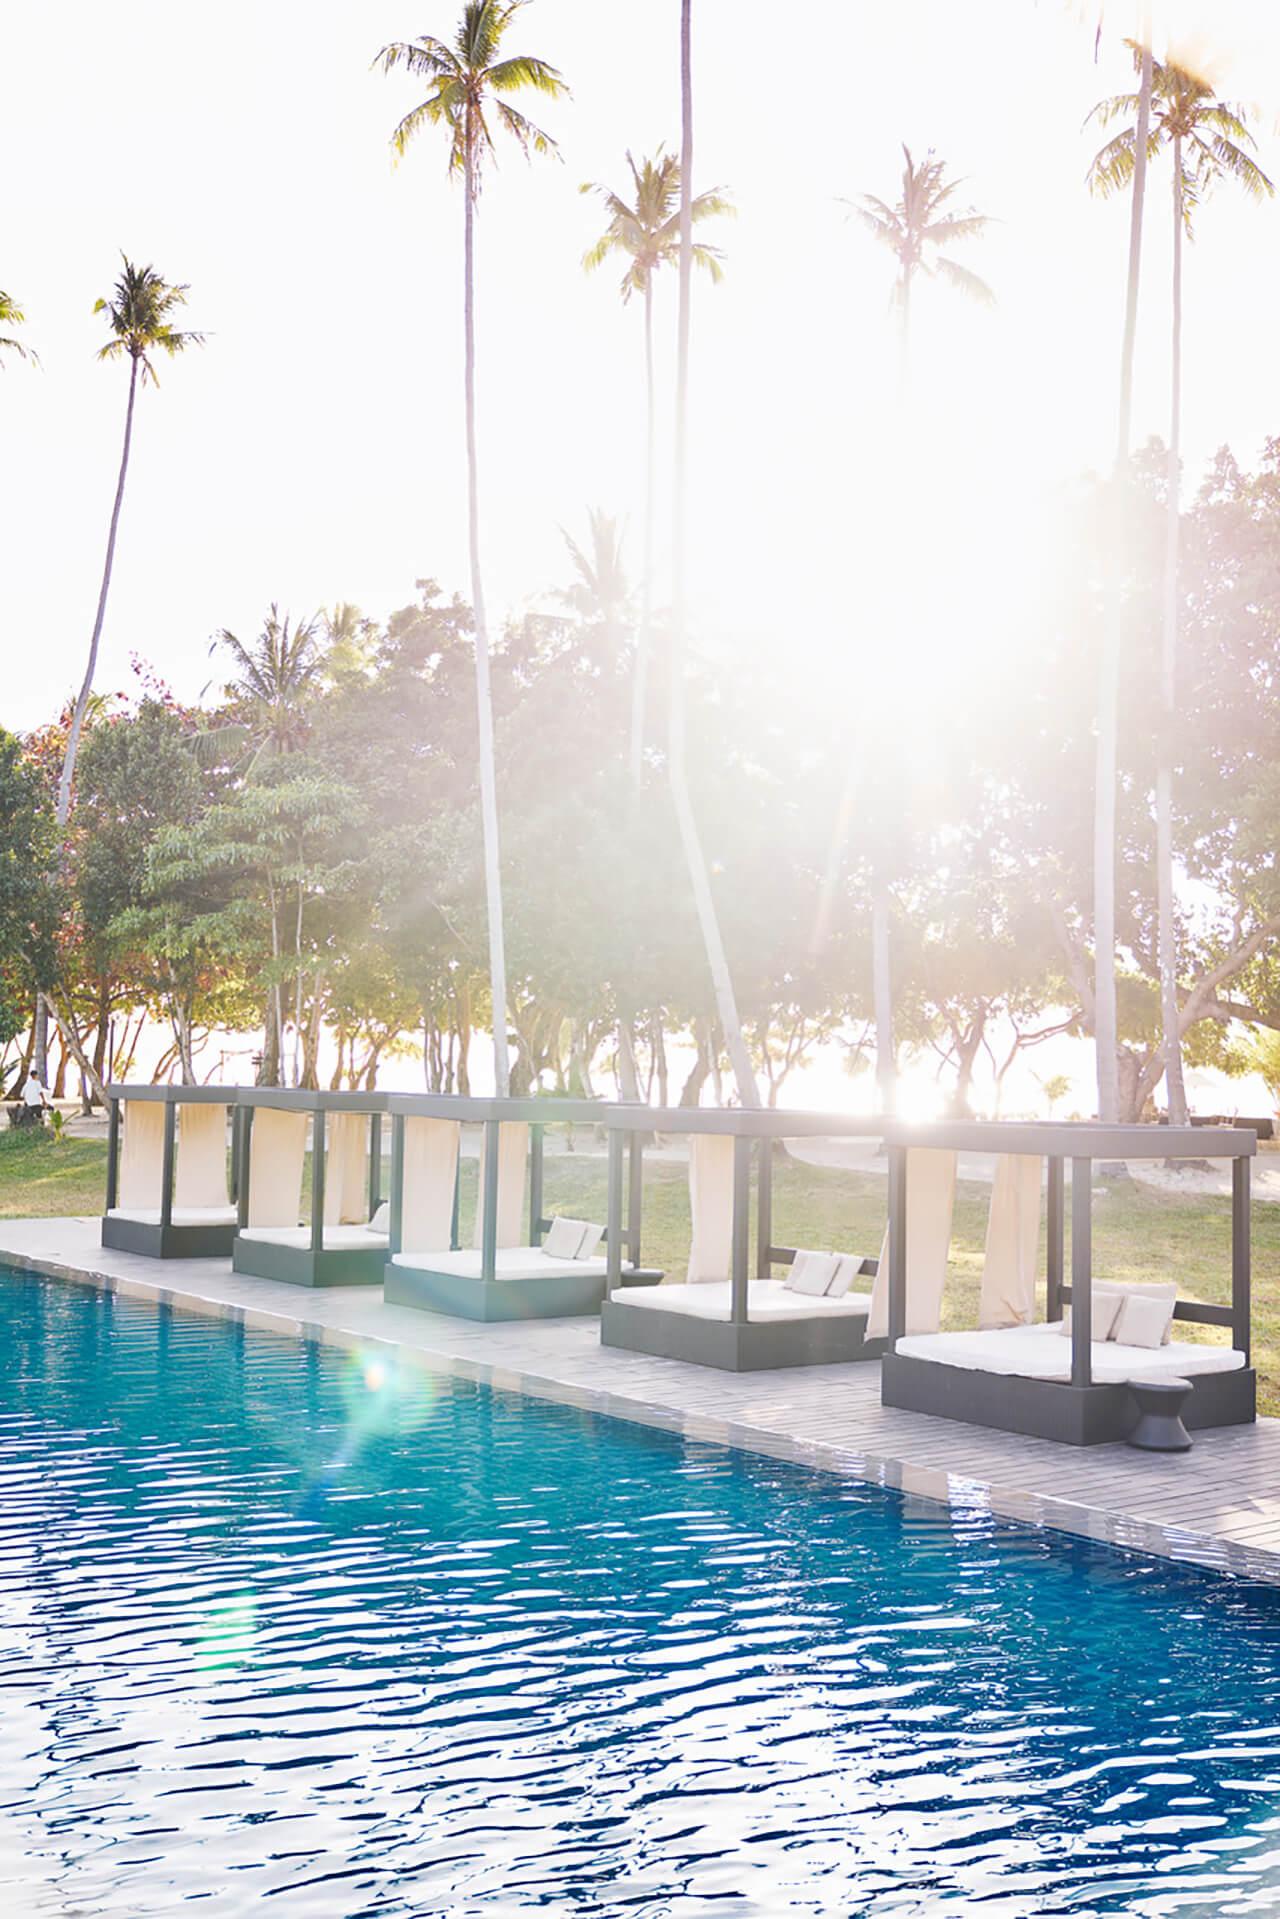 Poolside view from Maremegmeg Beach Club, El Nido, Palawan.